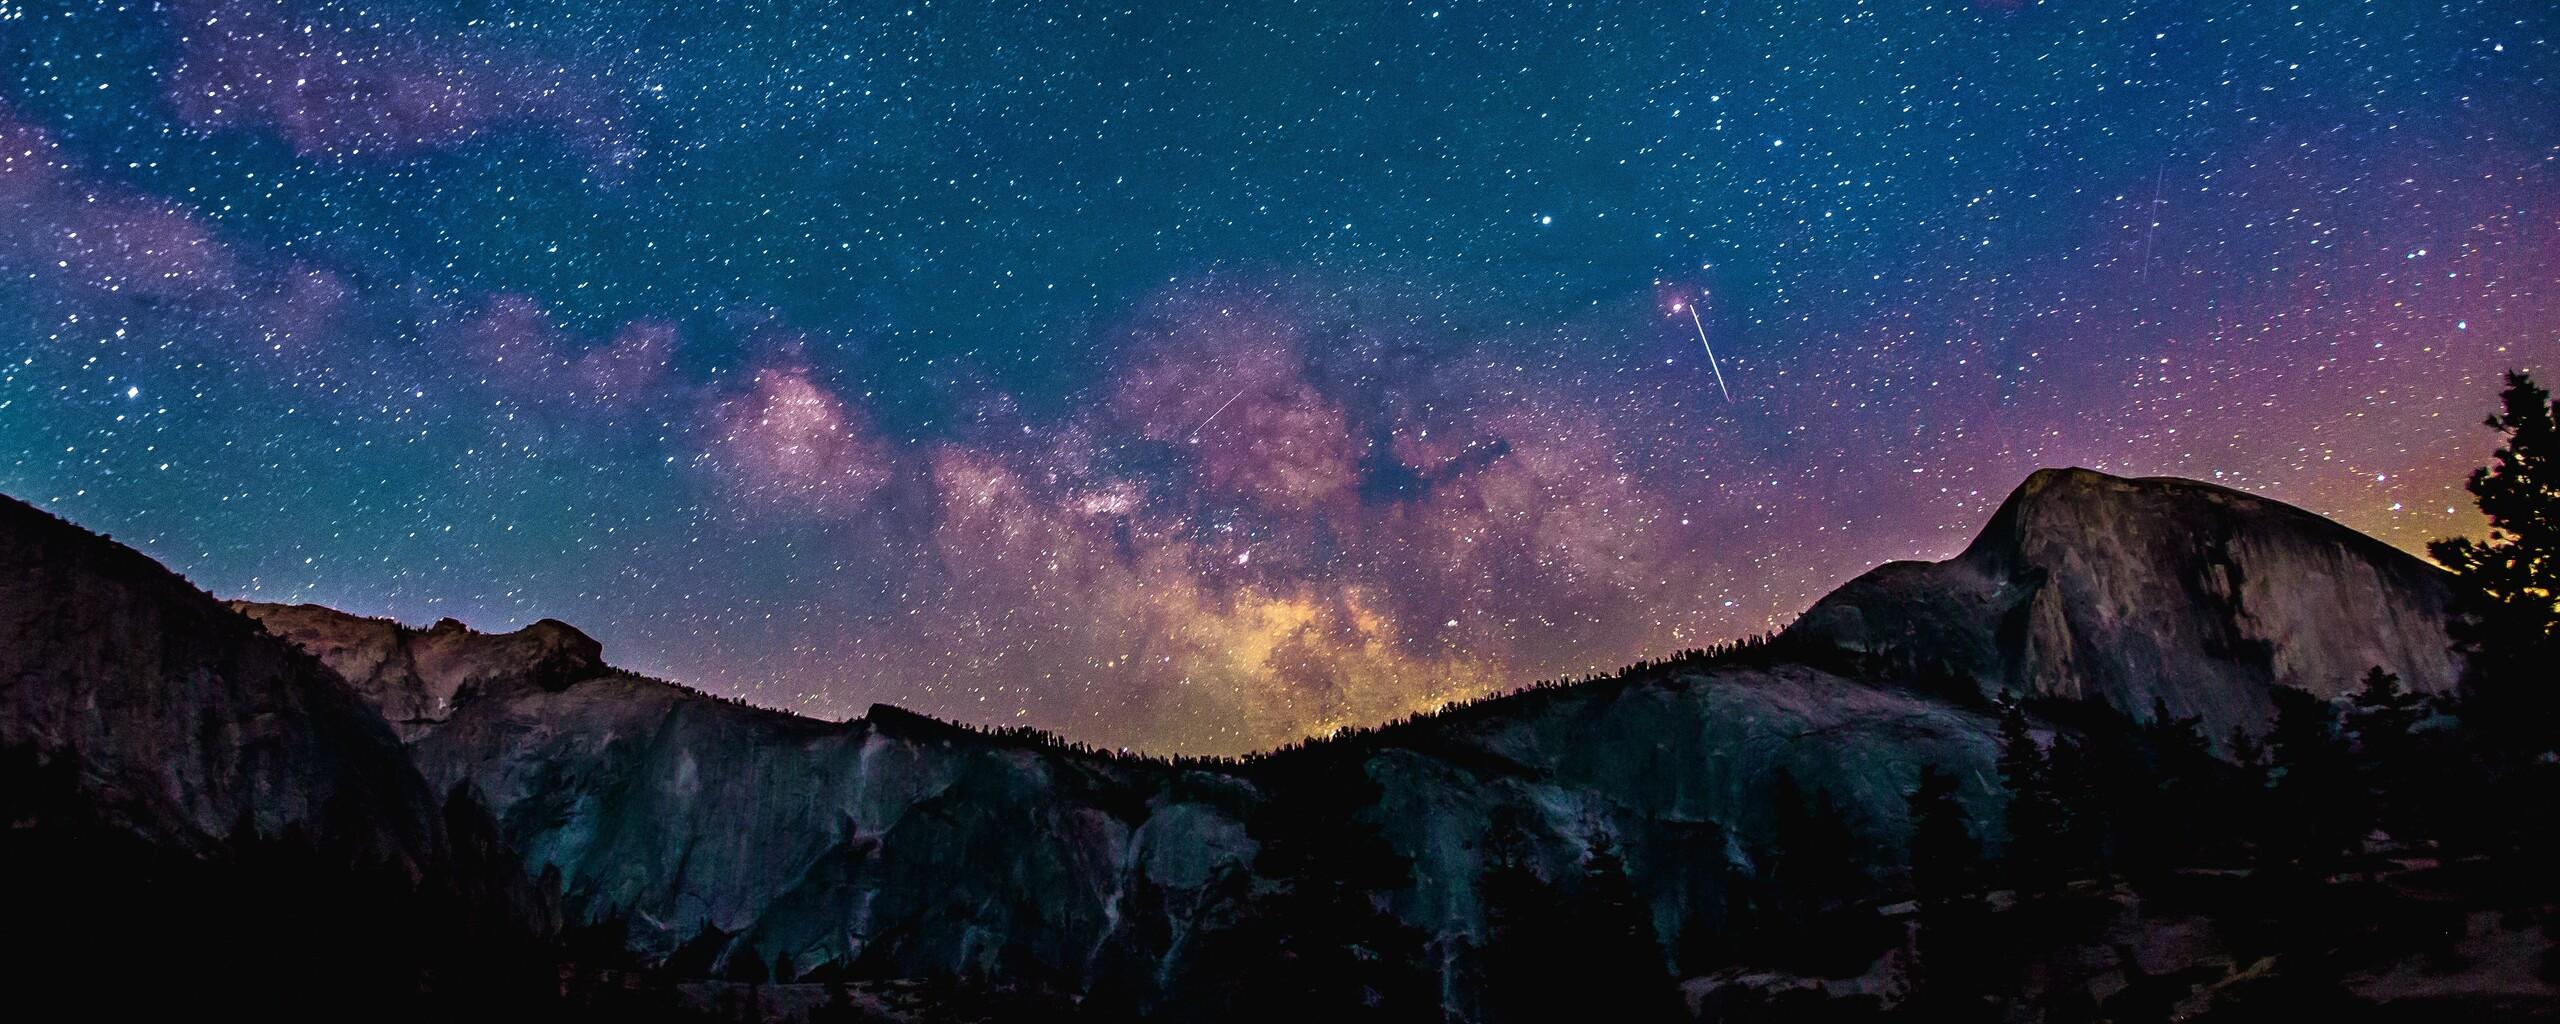 stars-space-landscape-mountains-ki.jpg